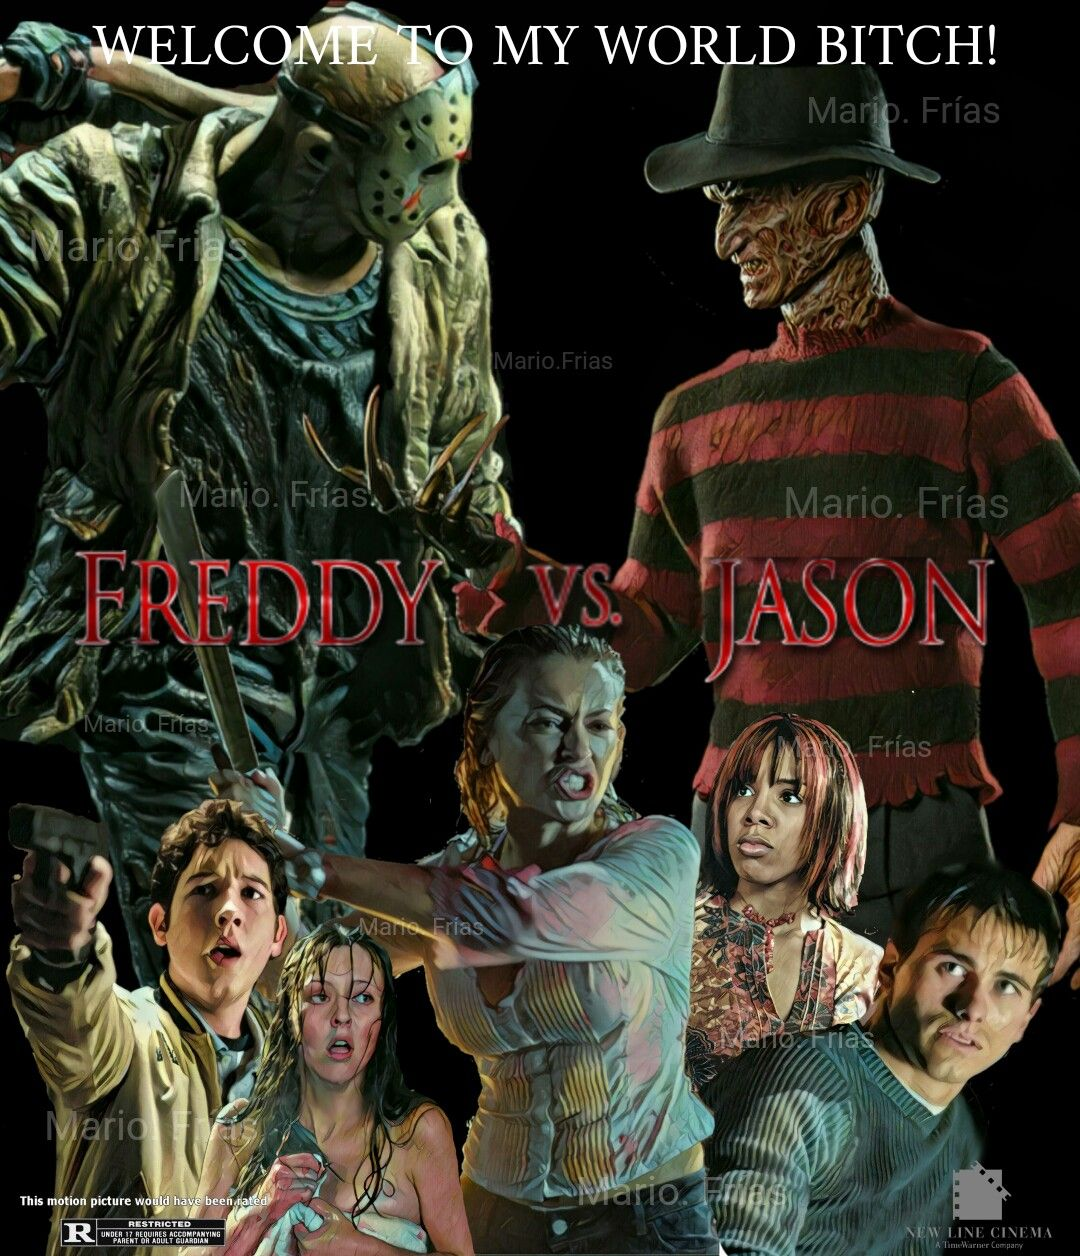 freddy vs jason horror movie slasher fan made by mario fr iacute as freddy vs jason 2003 horror movie slasher fan made by mario friacuteas